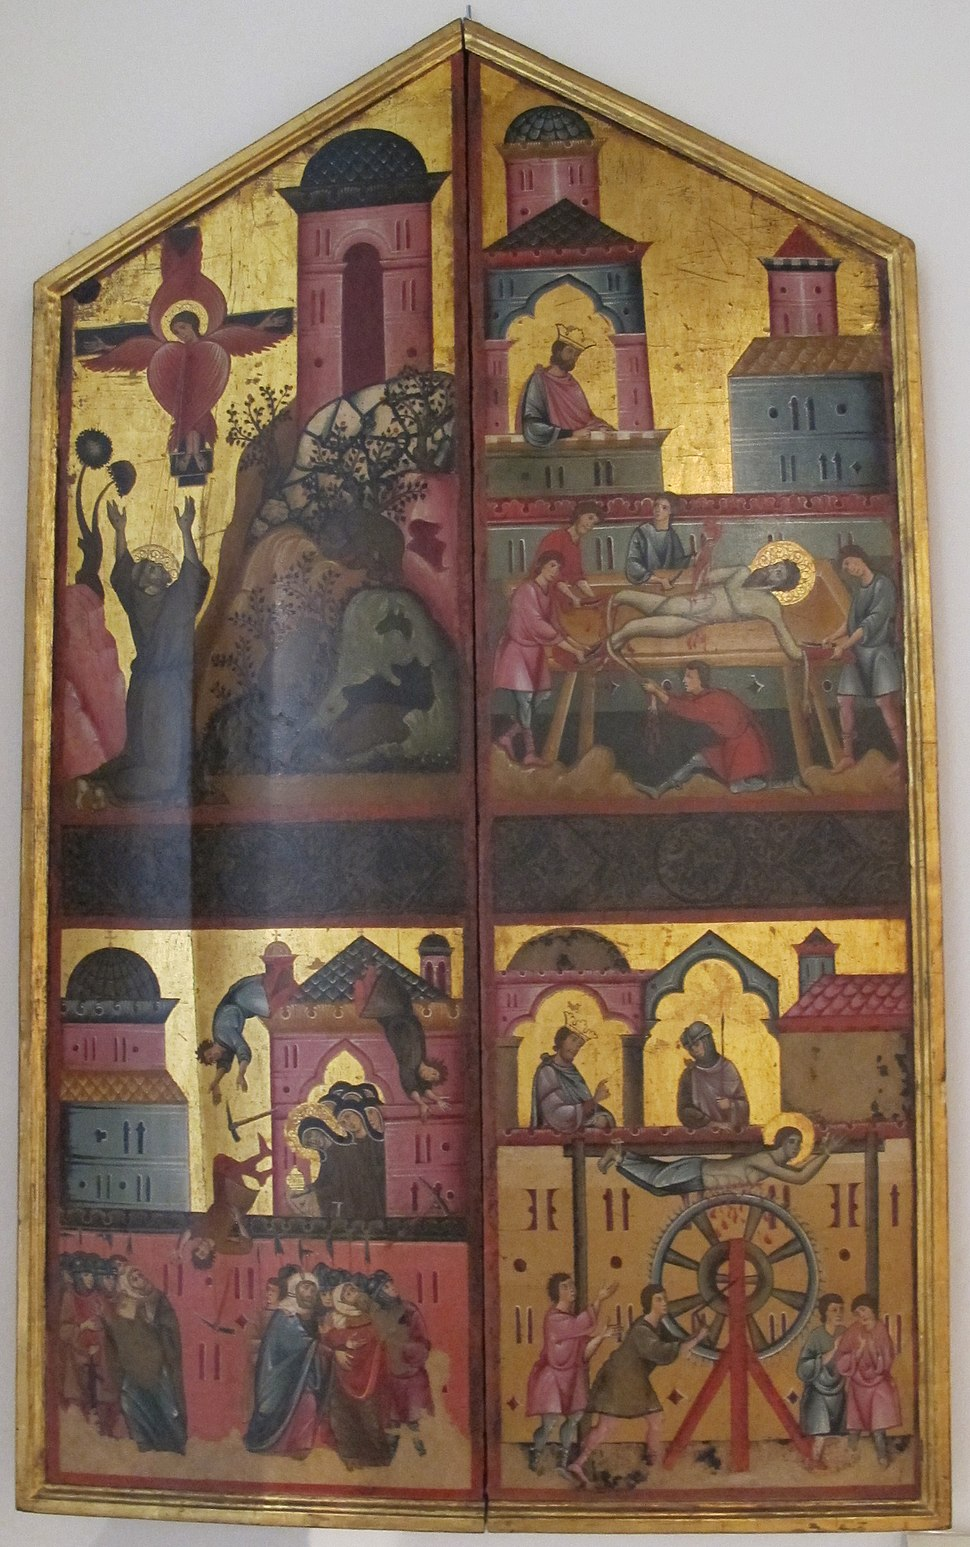 Dietisalvi di speme, dittico di s. chiara, 1280 ca